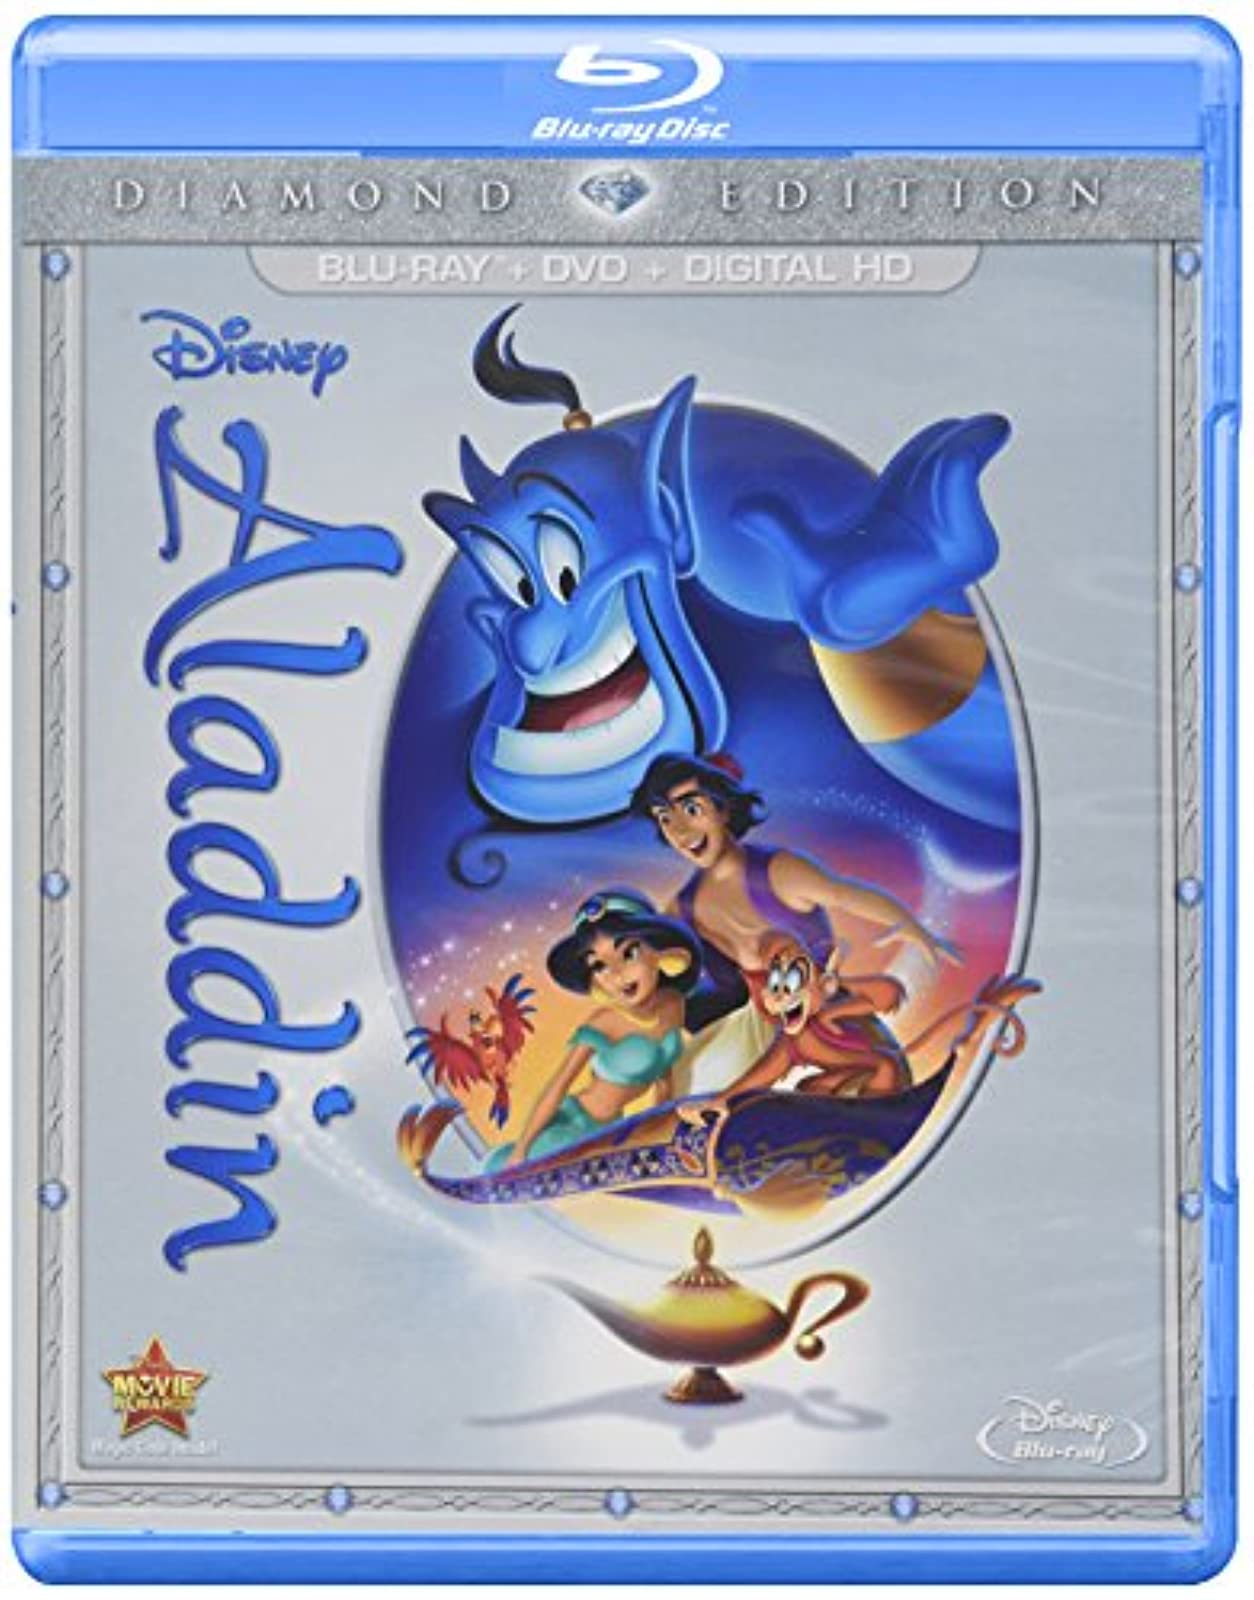 Aladdin: Diamond Edition Blu-Ray/dvd/digital HD On Blu-Ray With Robin Williams D